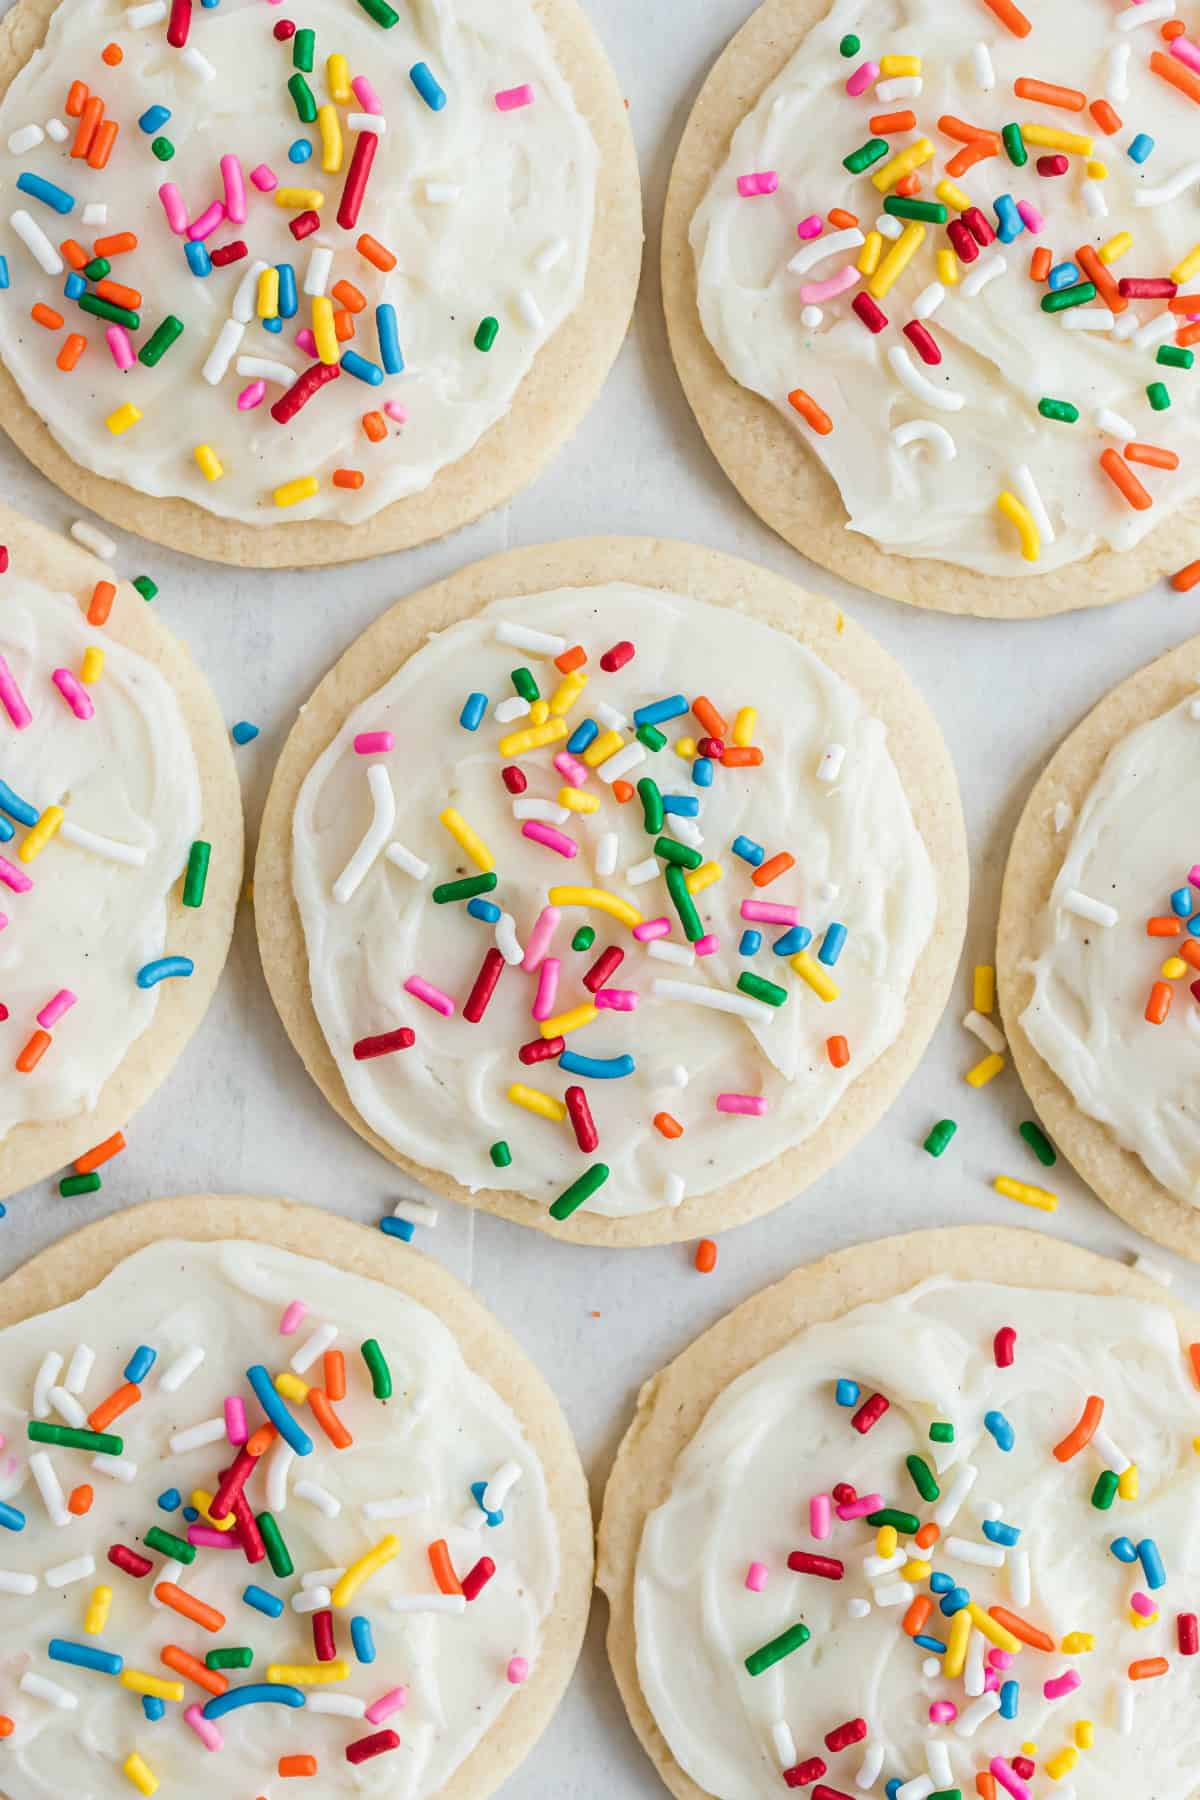 Sugar cookie frosting on circle cookies with festive sprinkles.